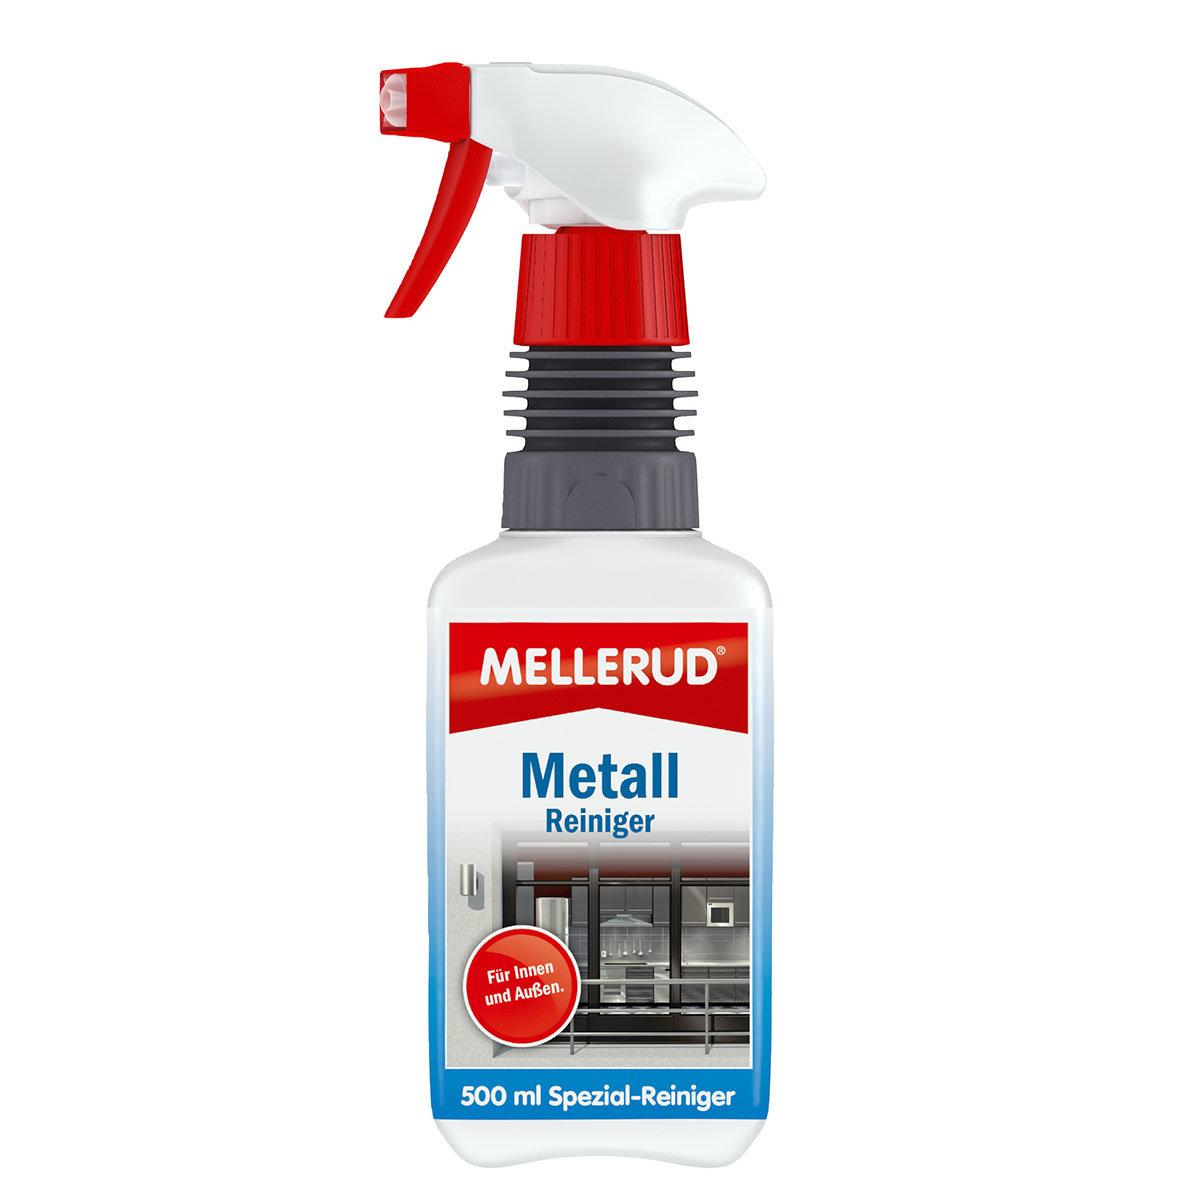 MELLERUD® Metall Reiniger 0,5 l